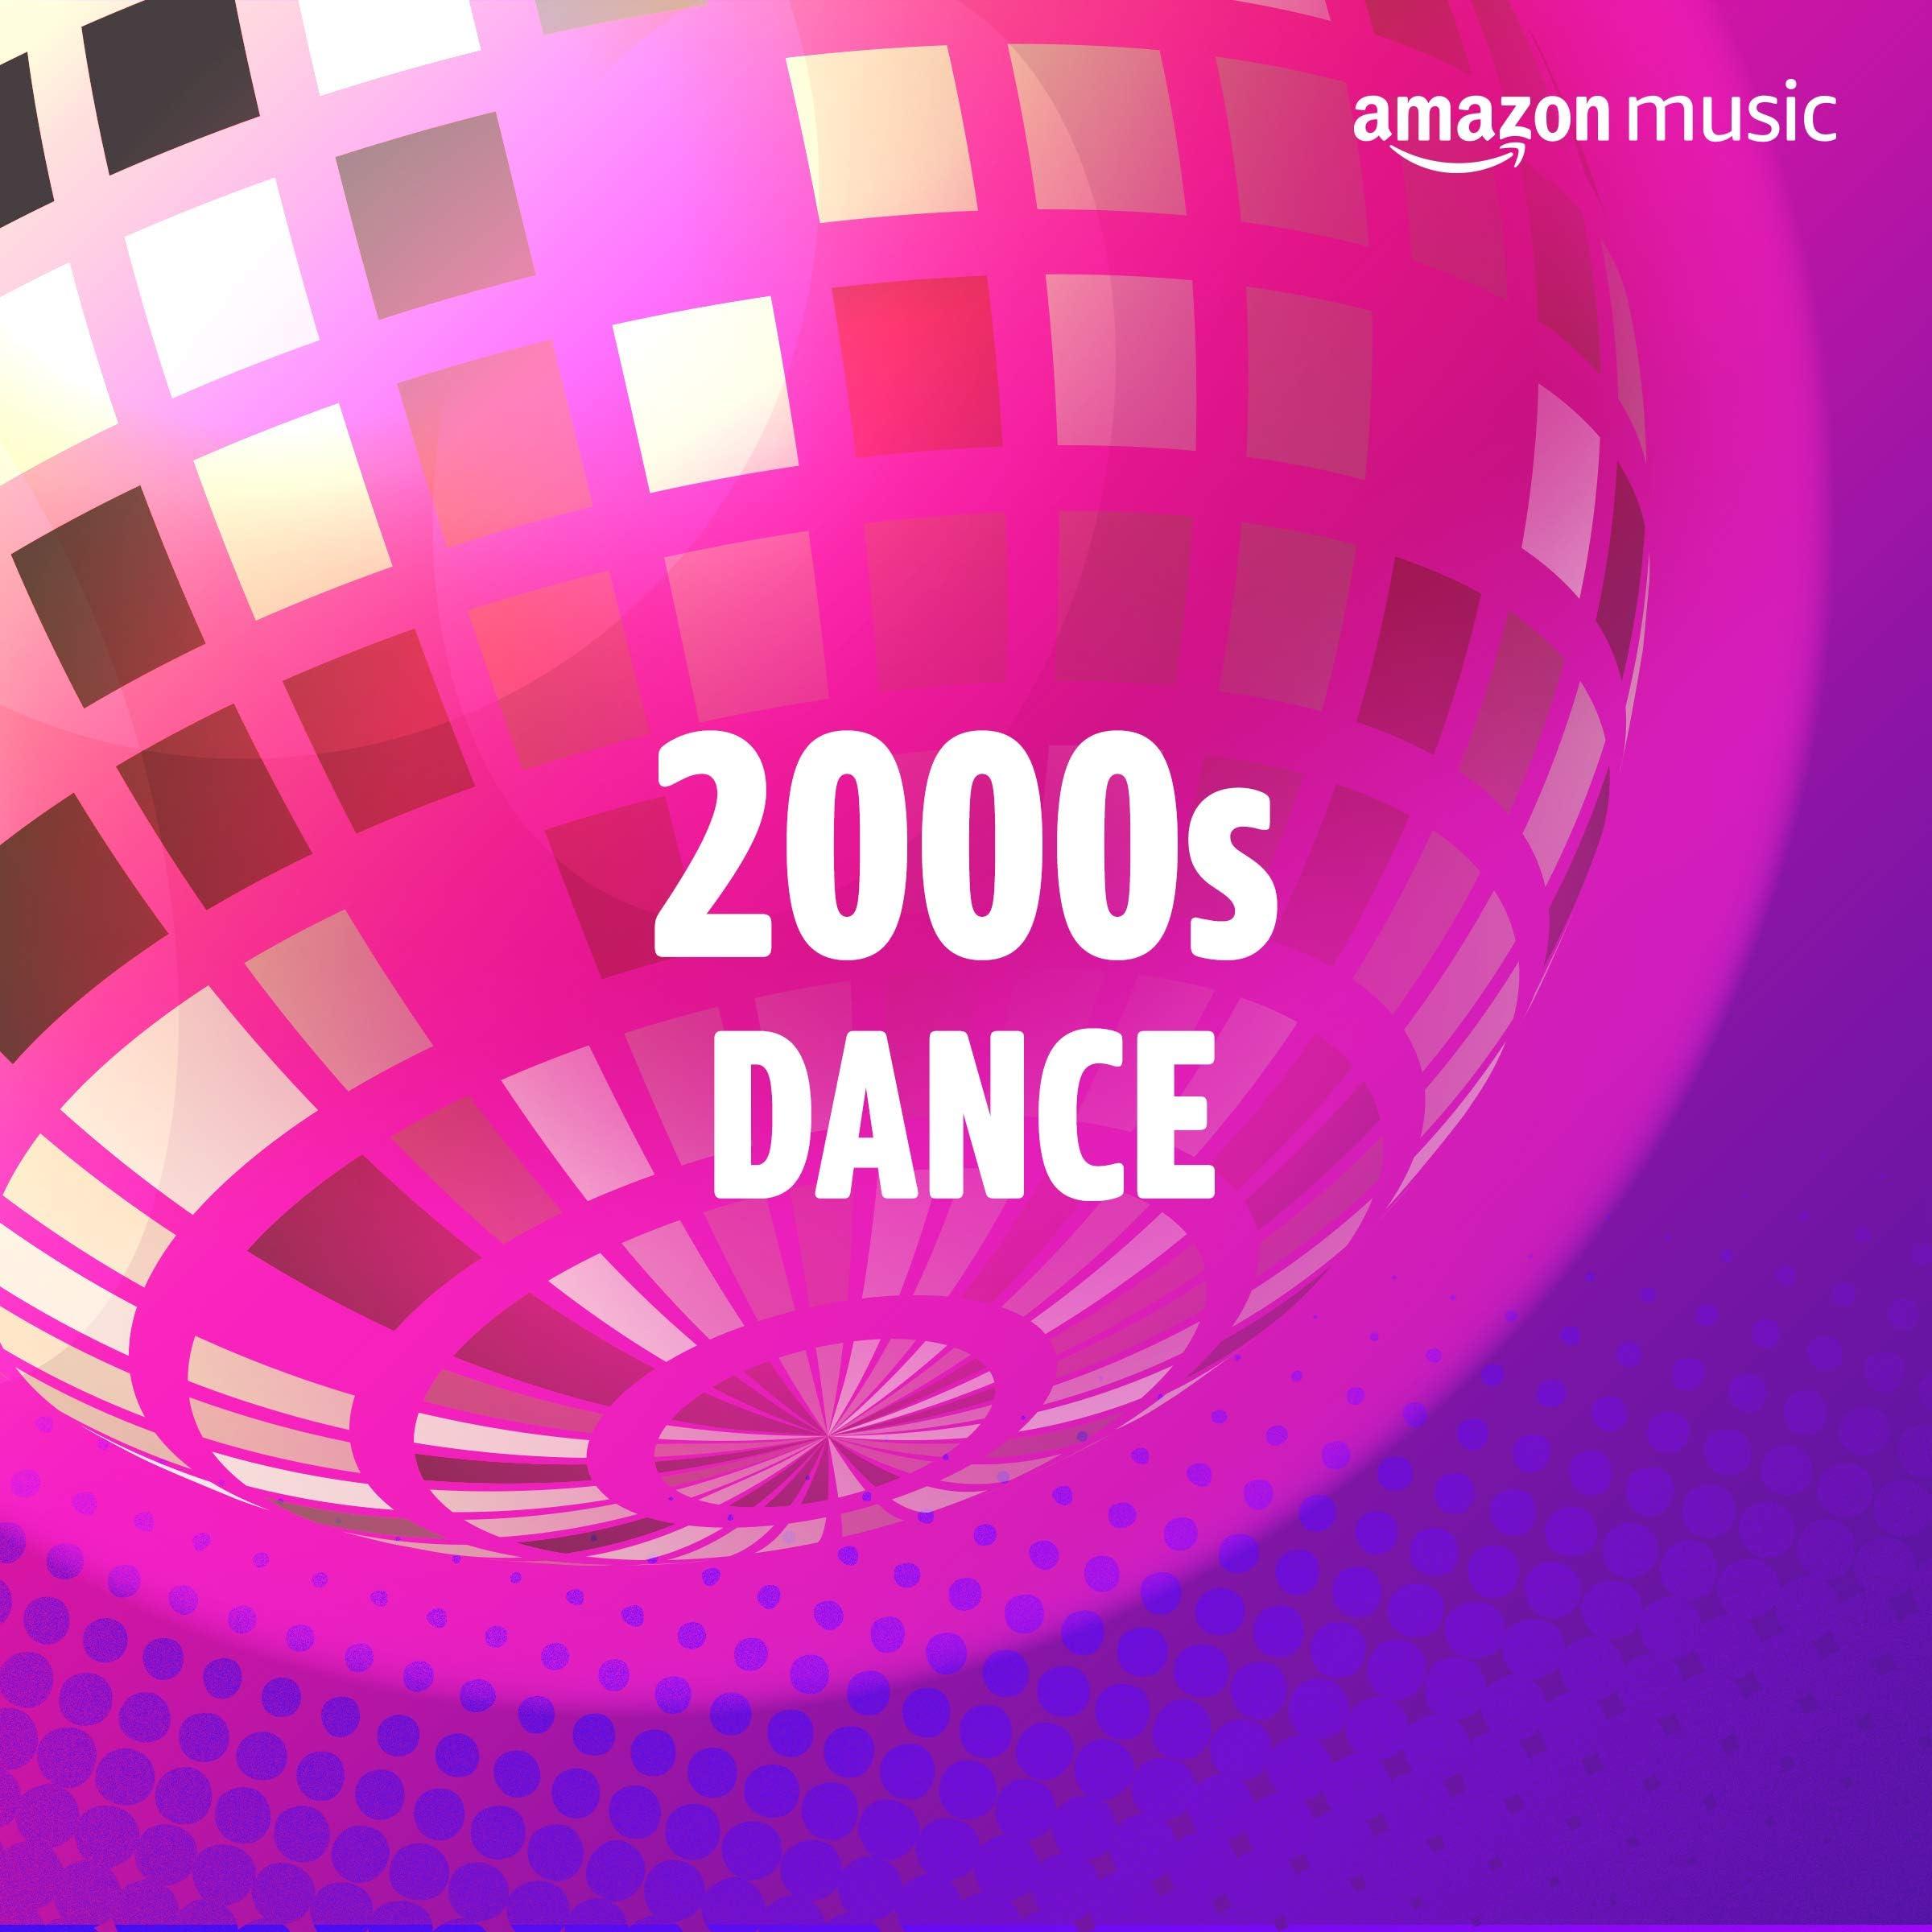 00s Dance